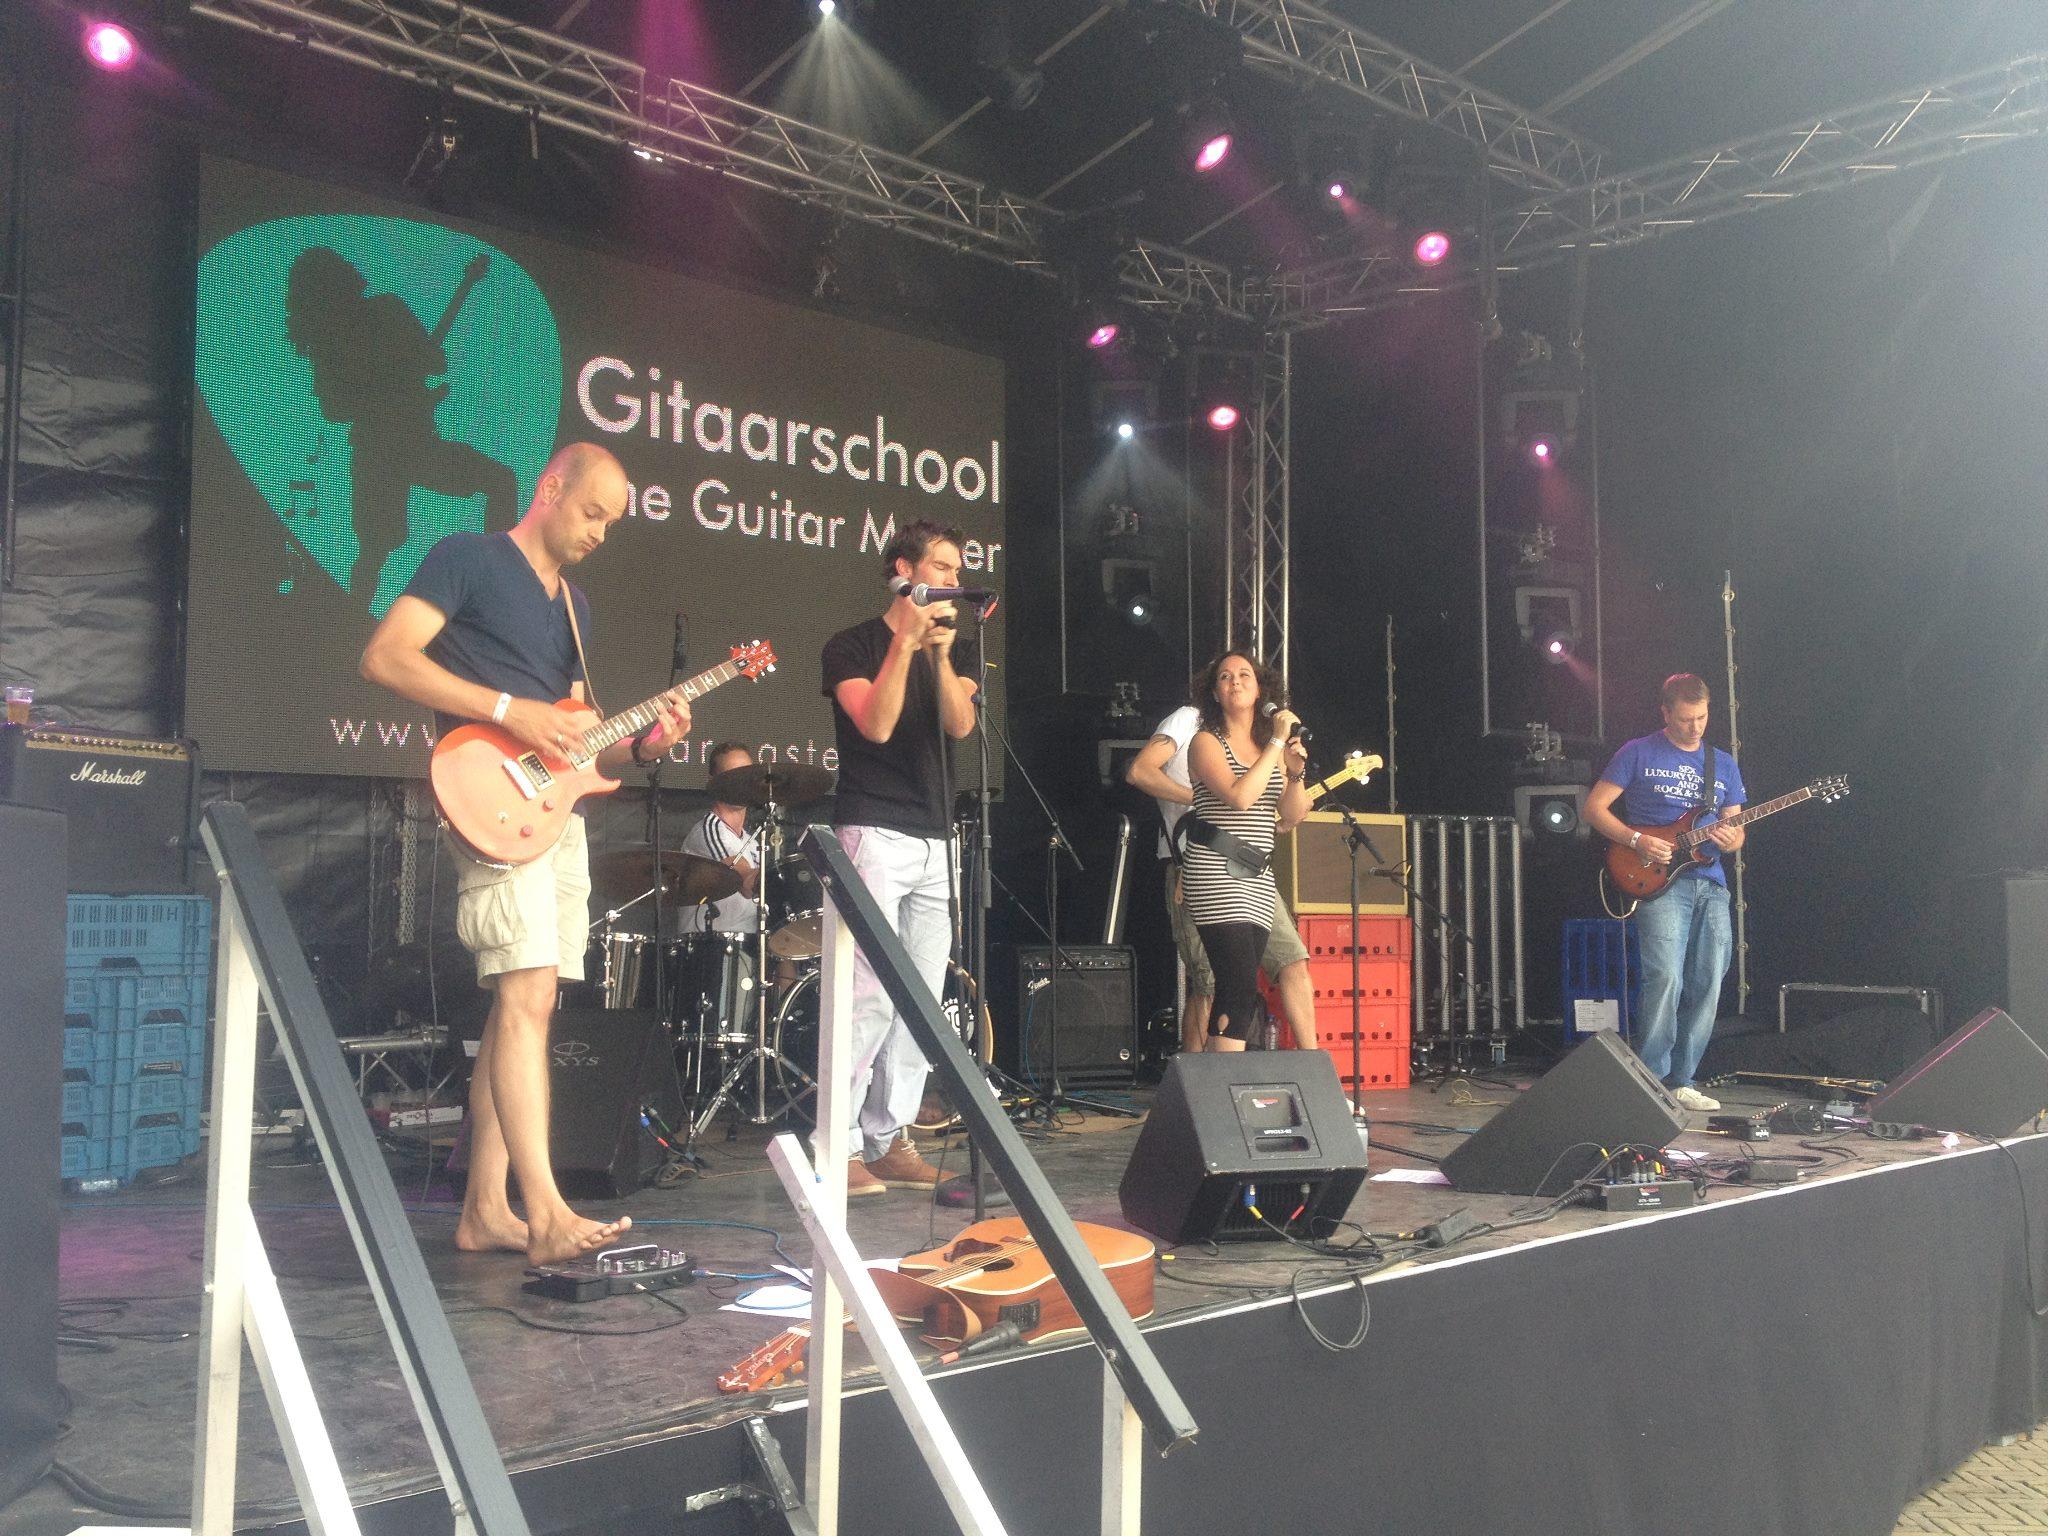 TheMonkeyMinds_Gitaarschool_The_Guitar_M